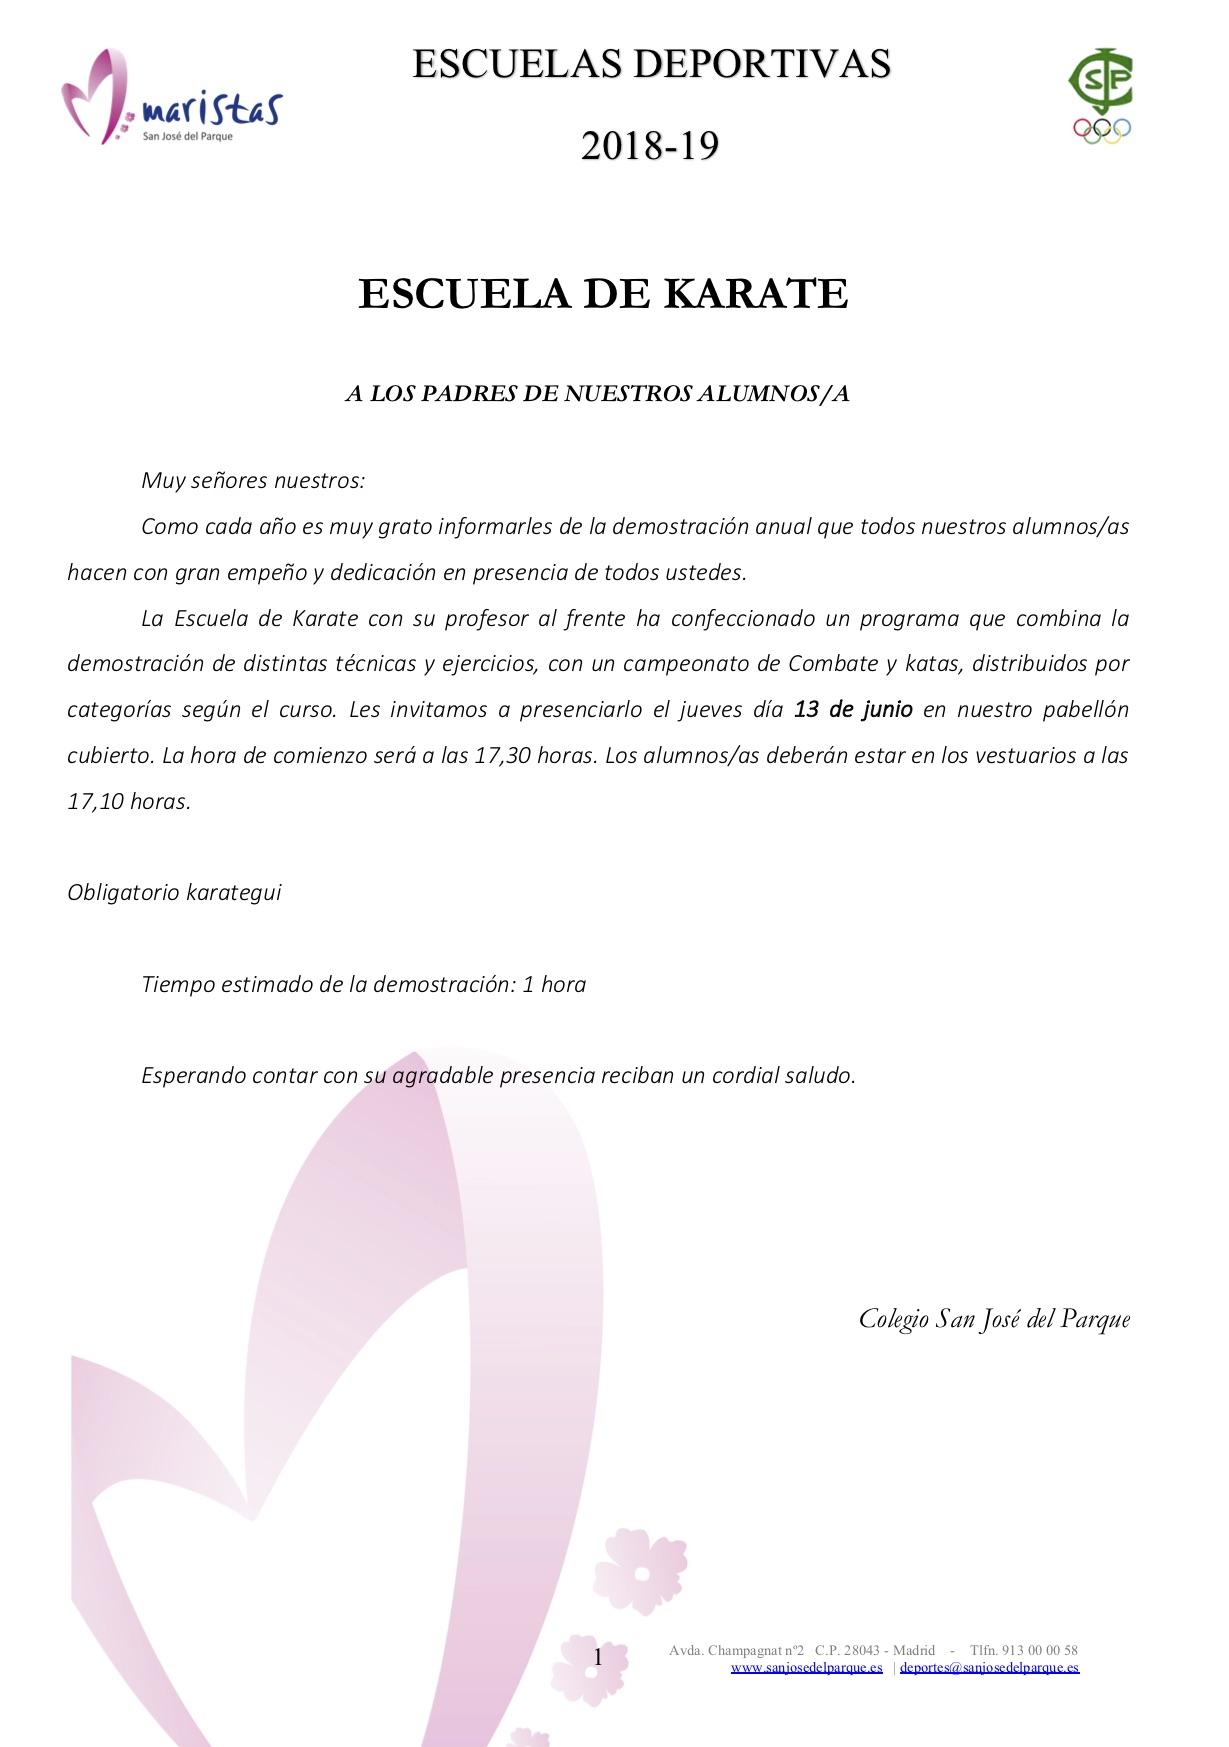 Karate @ Colegio SJP